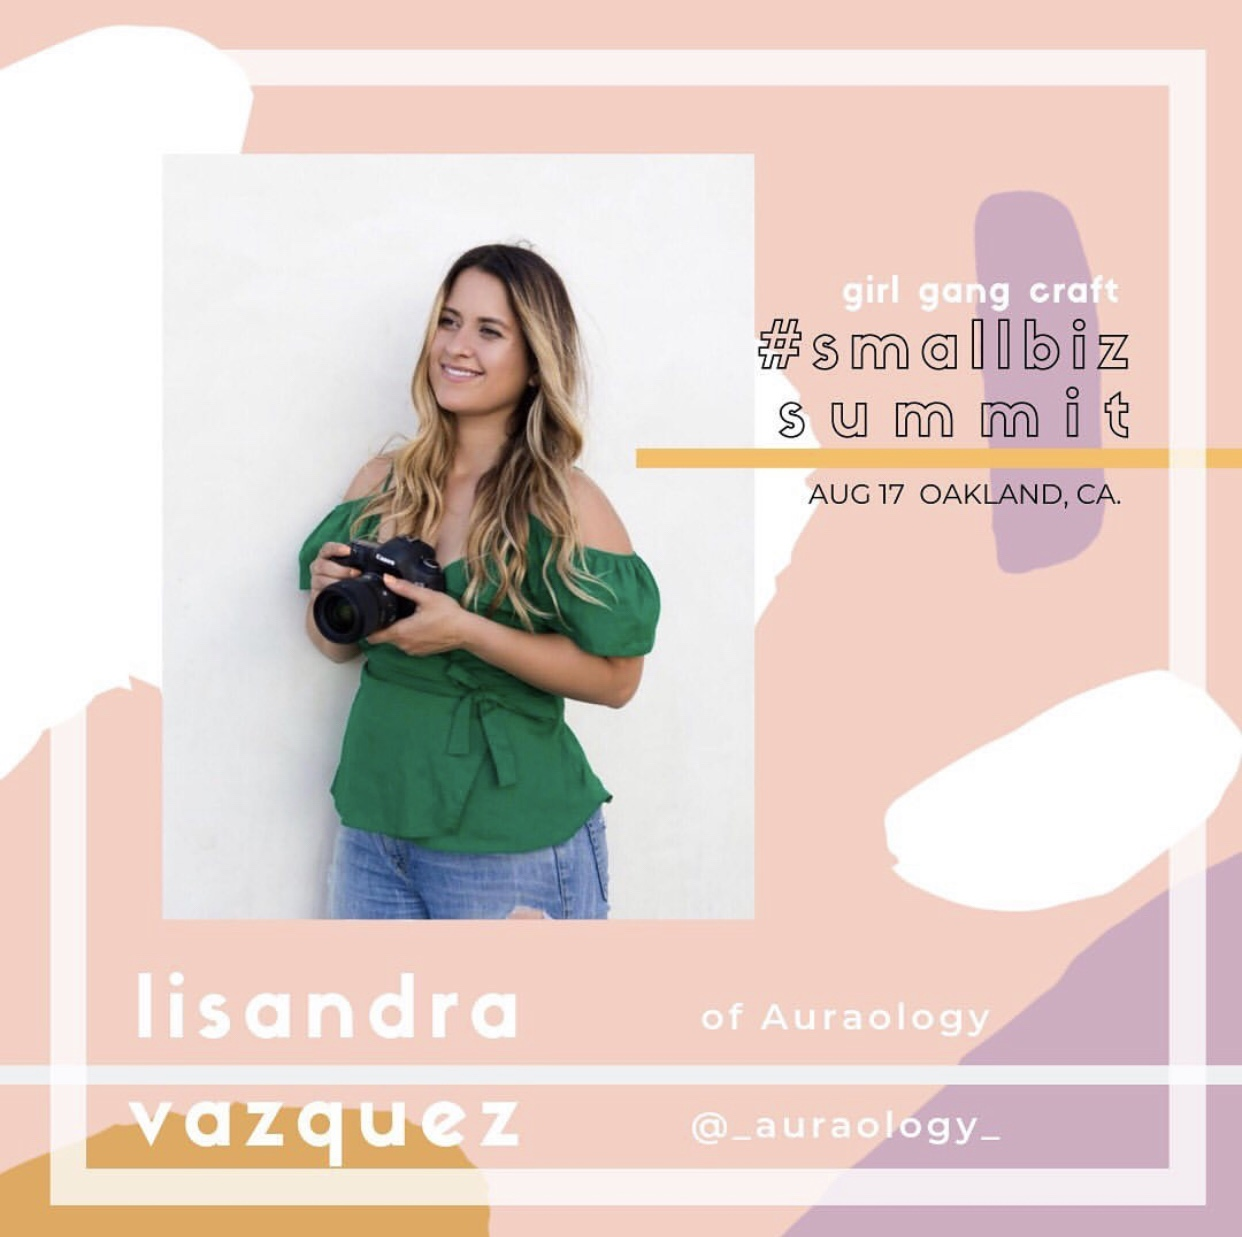 LISANDRA VAZQUEZ: - PANEL + HEADSHOTS@lisandra__vazquez + @_auraology_